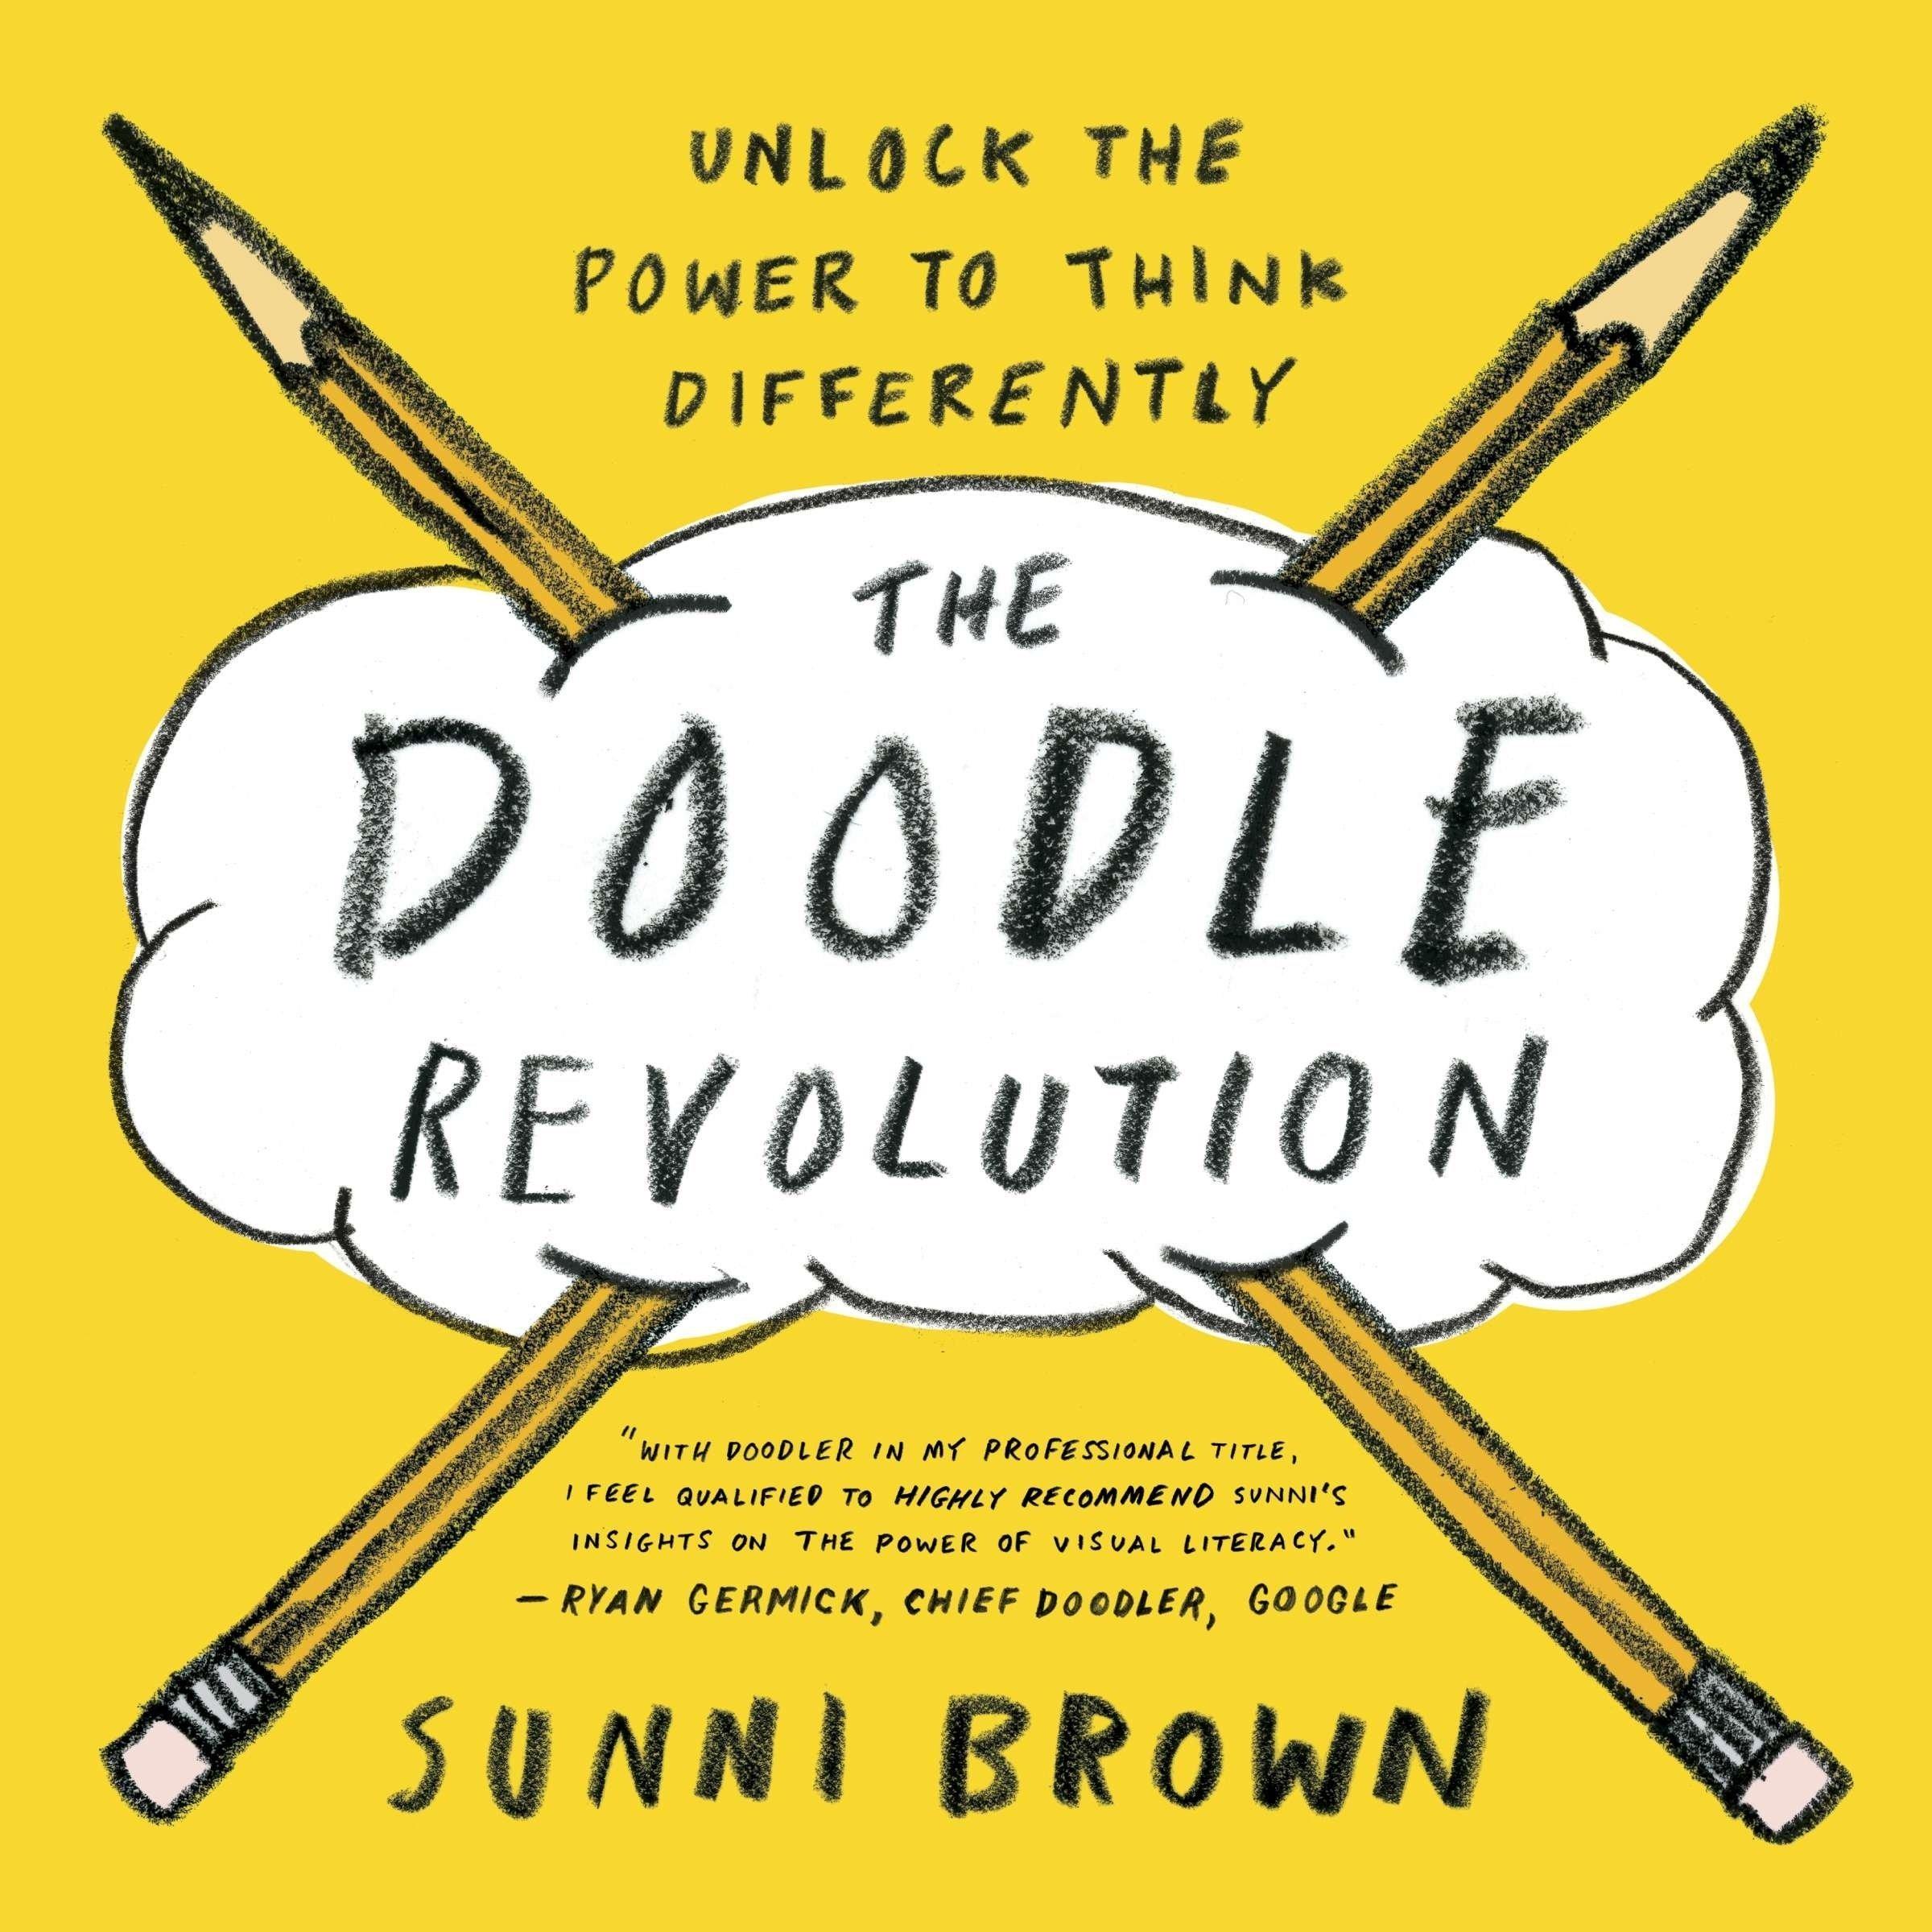 Doodle Revolution Design Thinking Tools.jpg